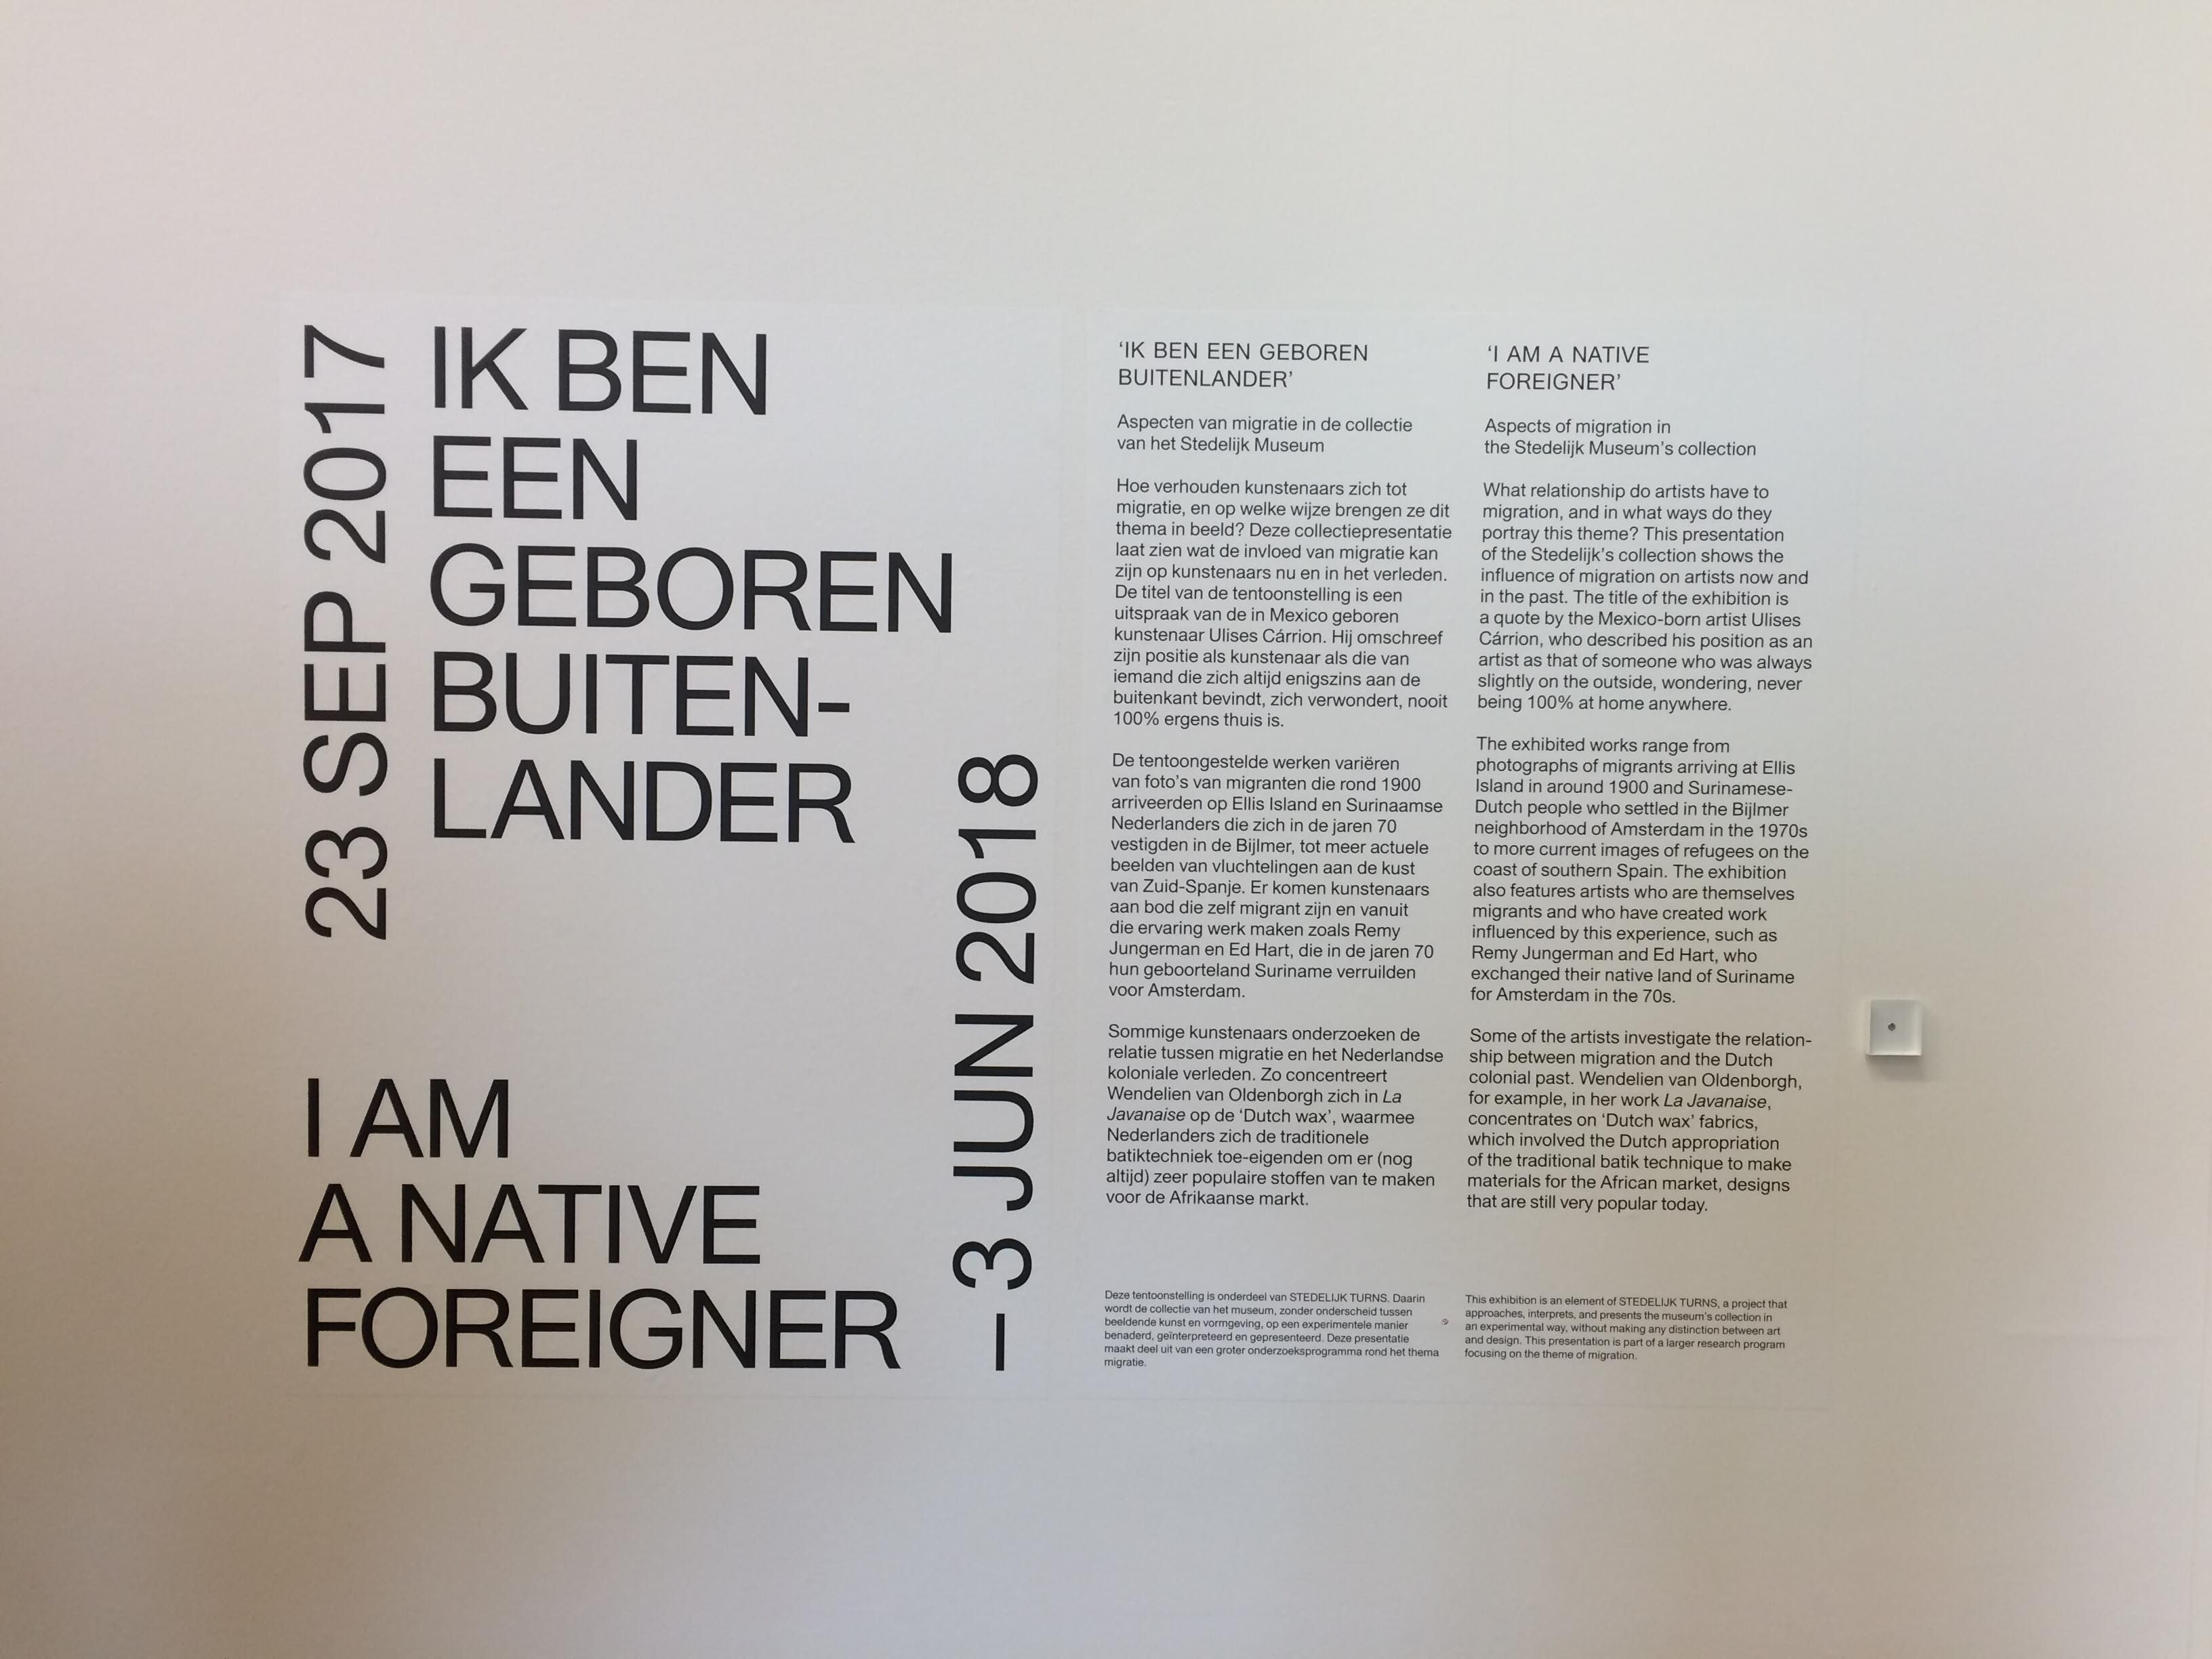 Wayfinding From The Stedelijk Museum Amsterdam